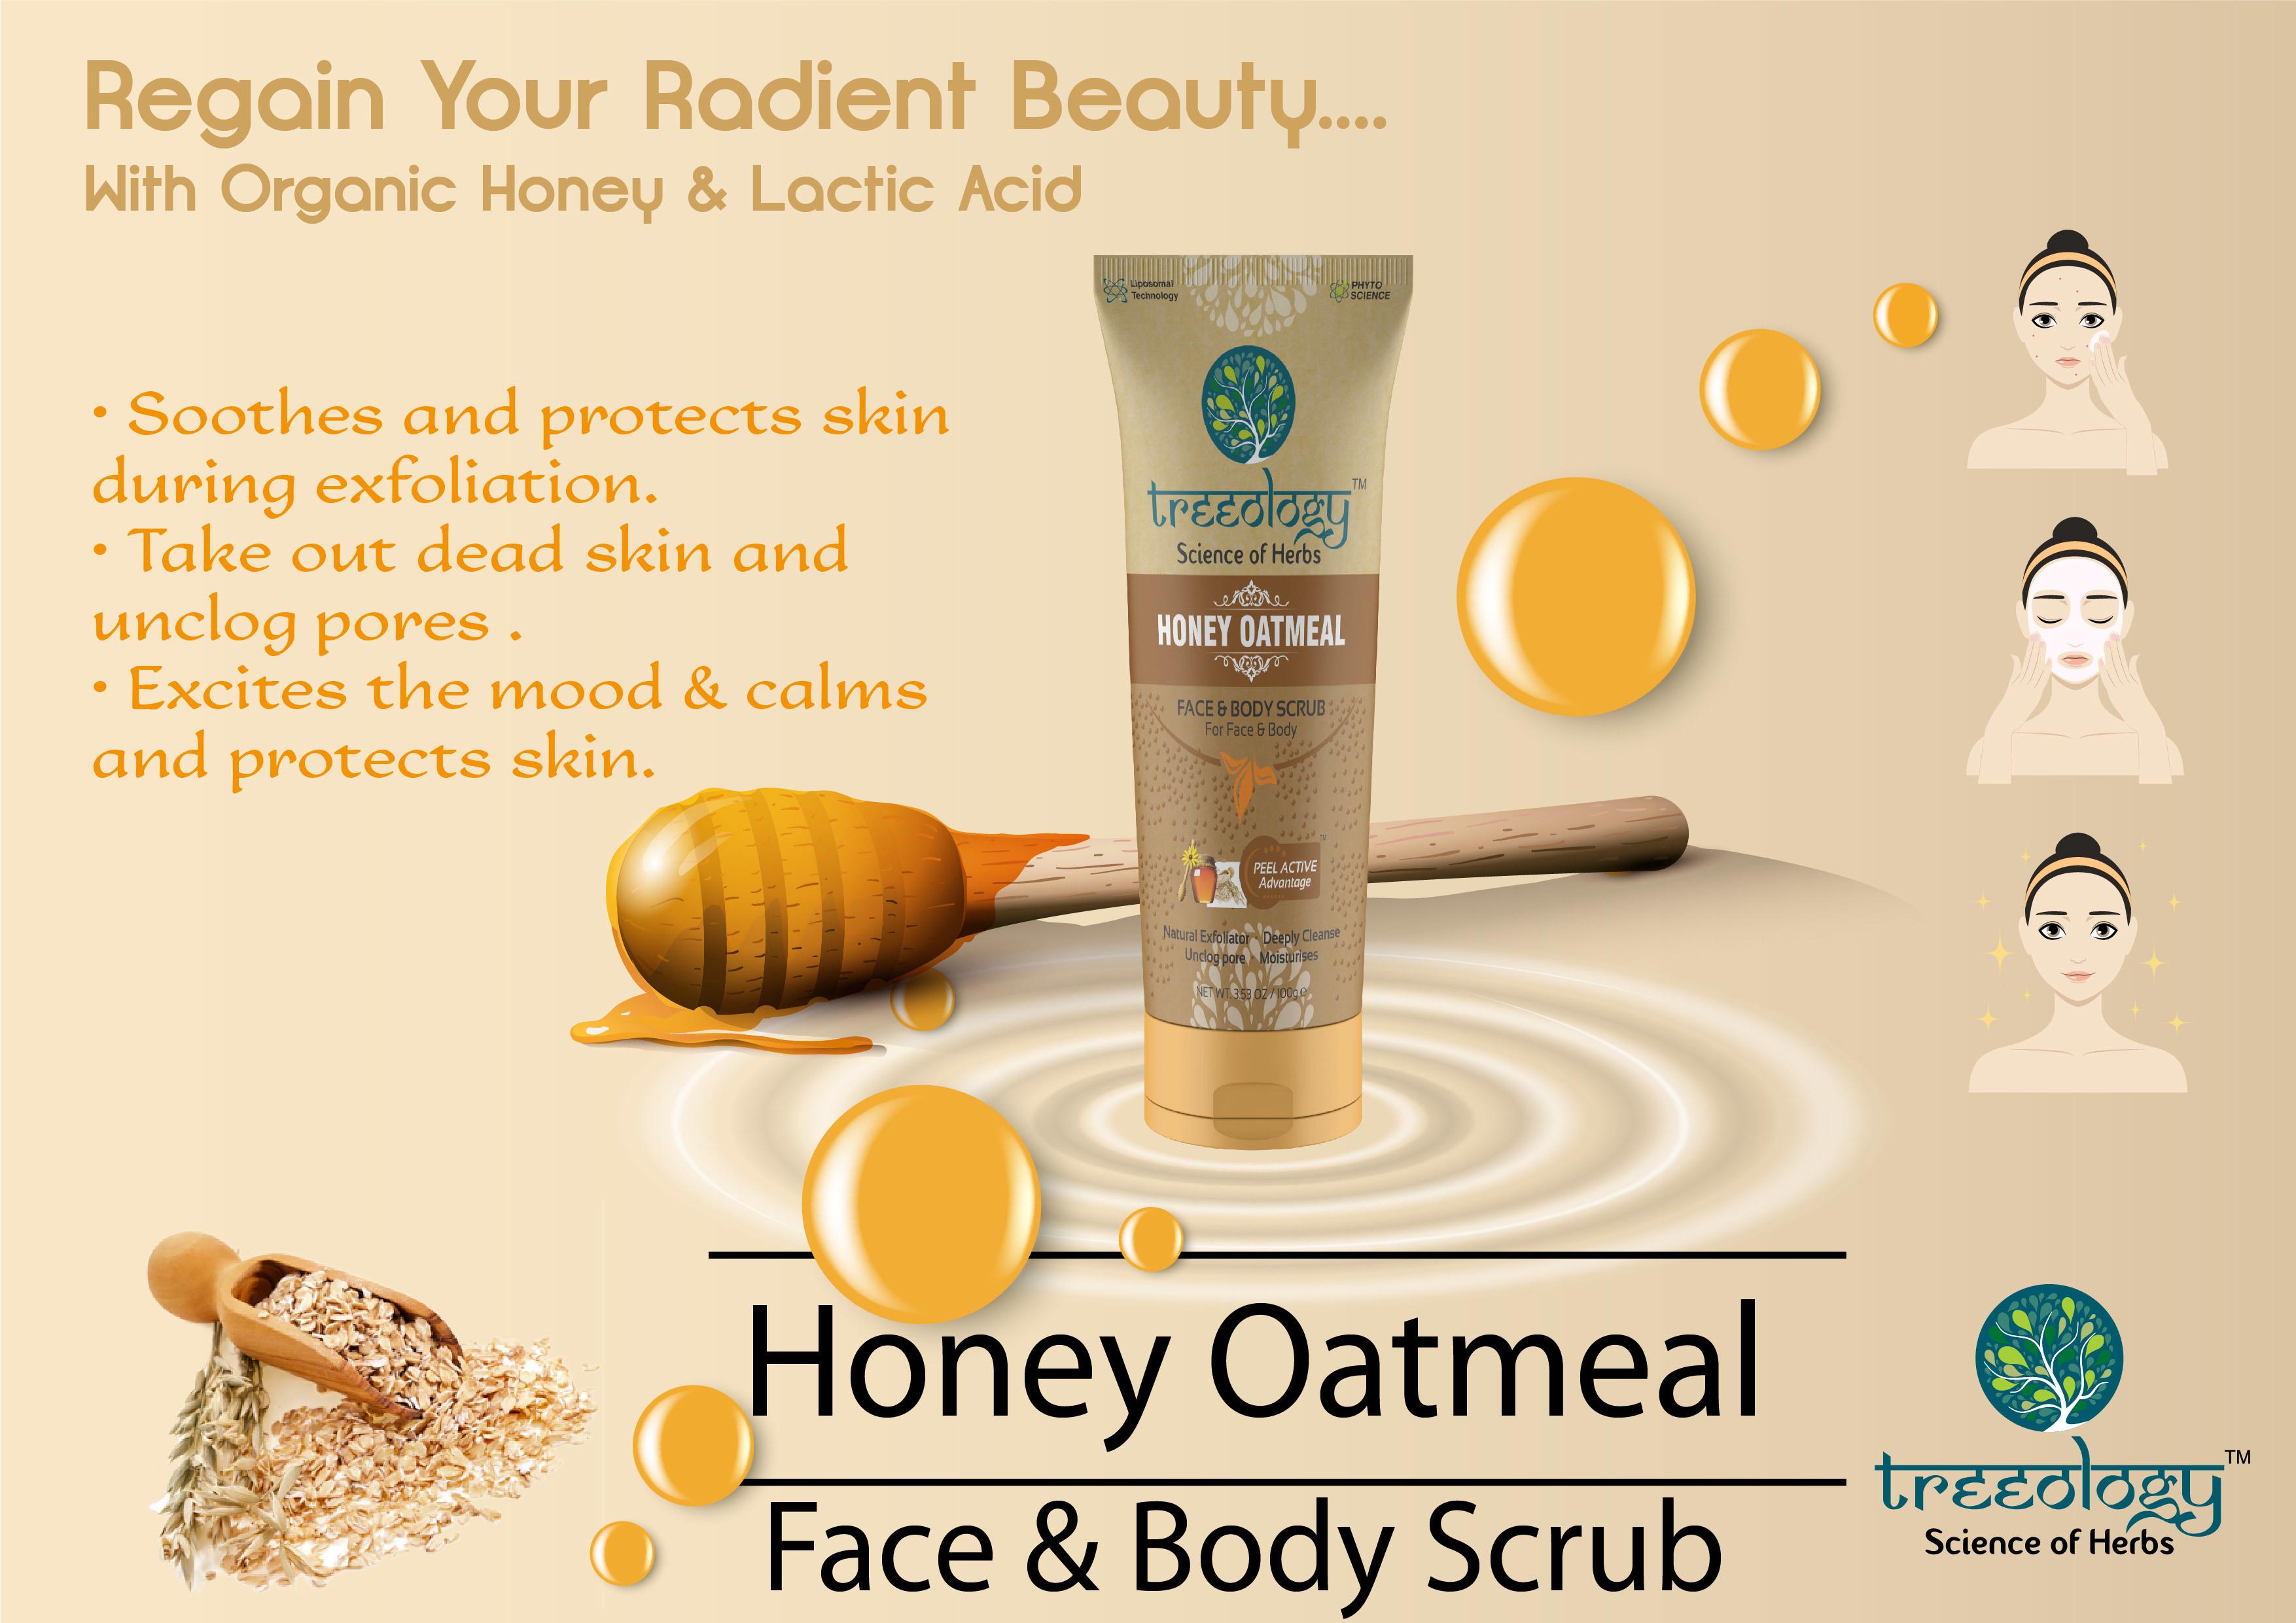 Honey Oatmeal Face & Body Scrub